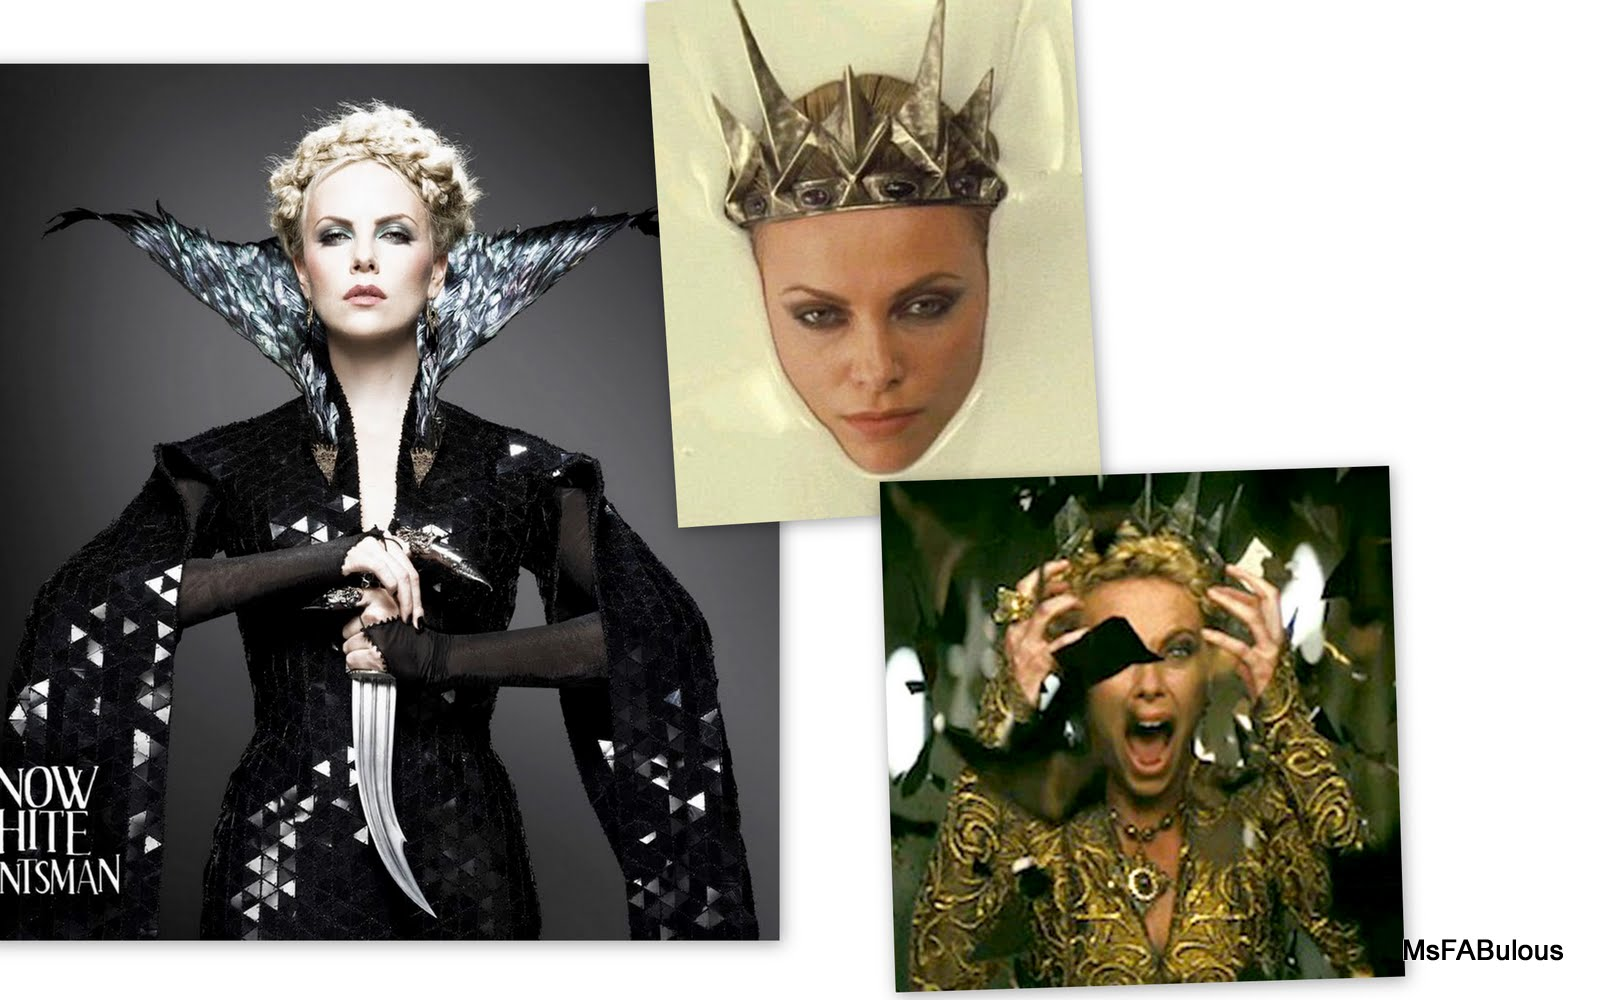 Courtesan Macabre Gothic Fashion Gothic Style Snow White The Huntsman Costume Style